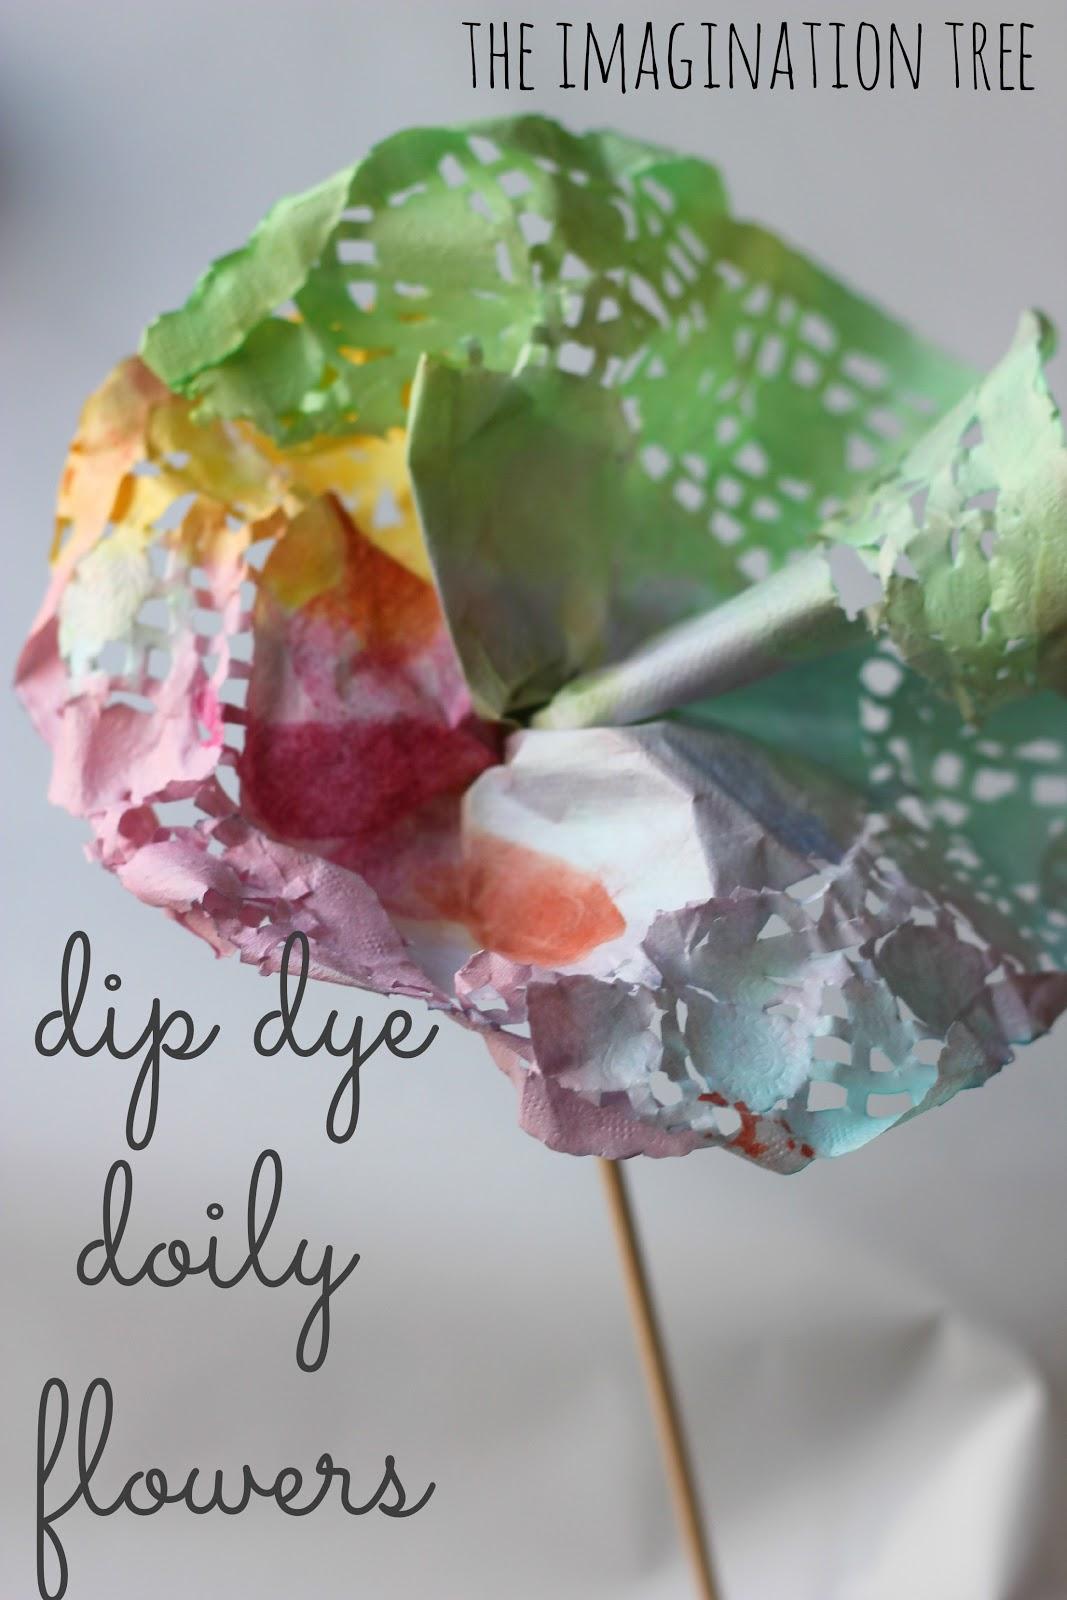 Dip dye doily flowers the imagination tree dip dye doily flowers jeuxipadfo Images